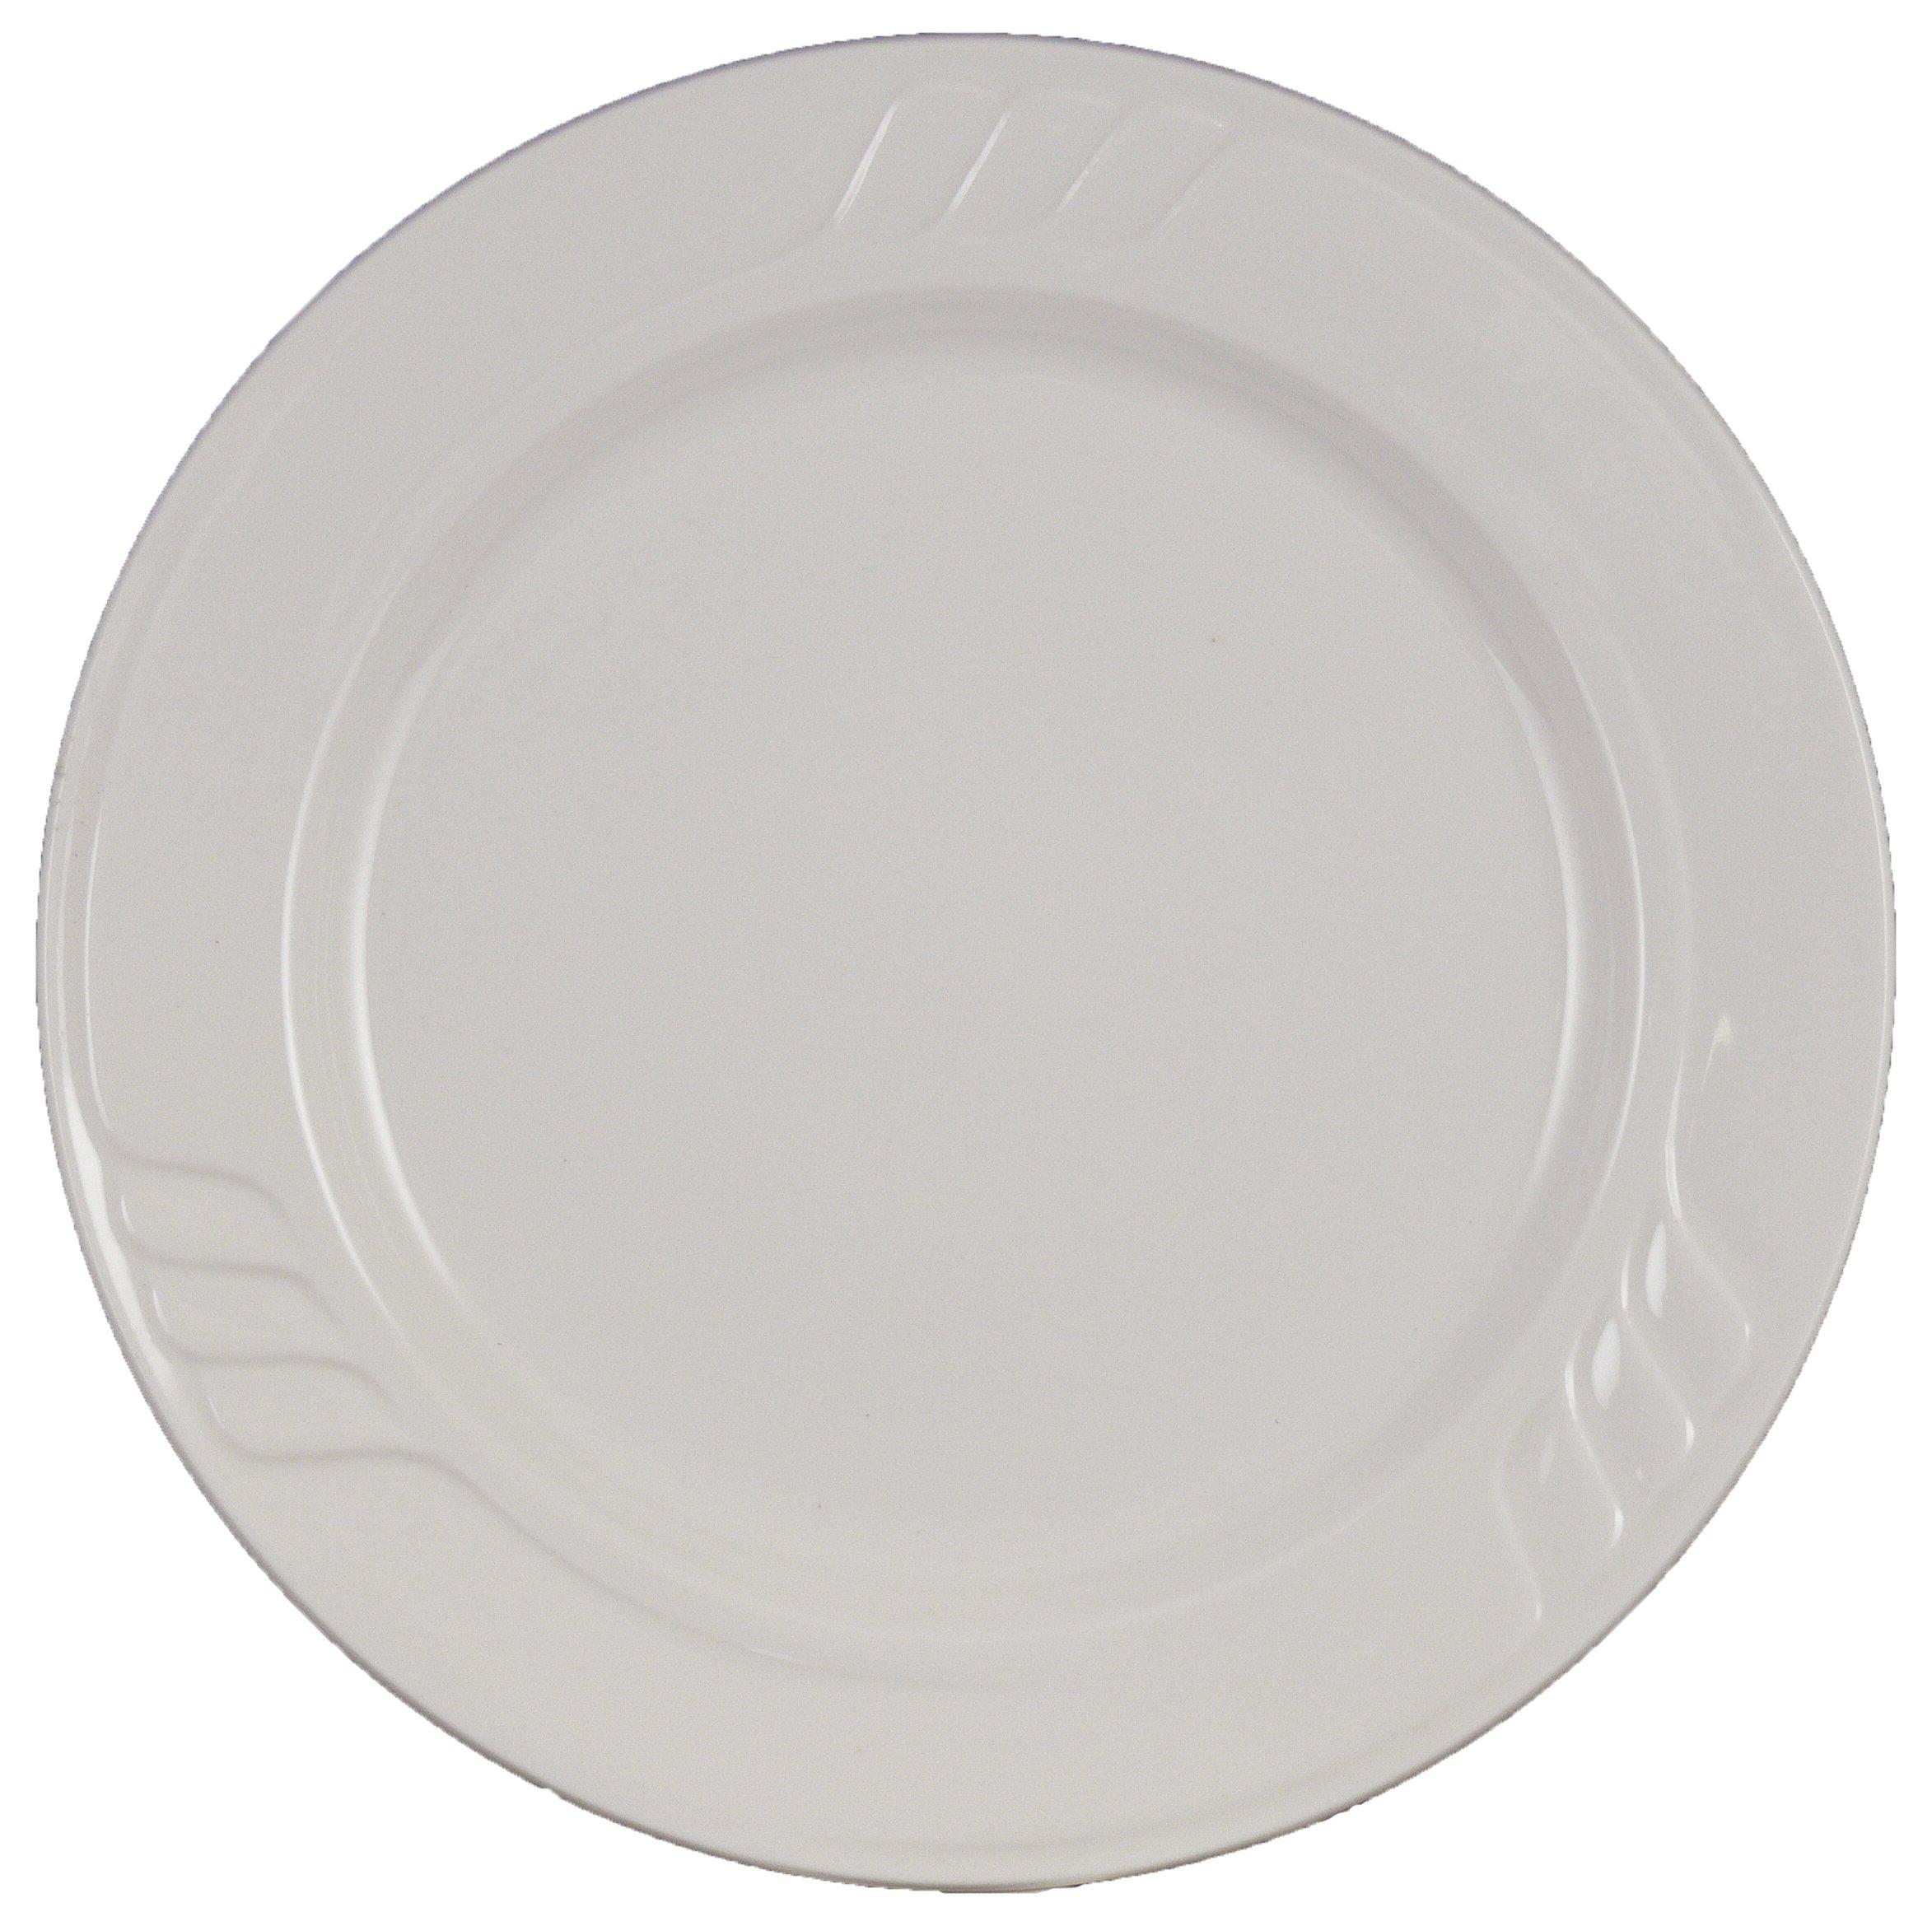 Vertex China SAU-22 Sausalito Plate, 8'', Bone White (Pack of 24)